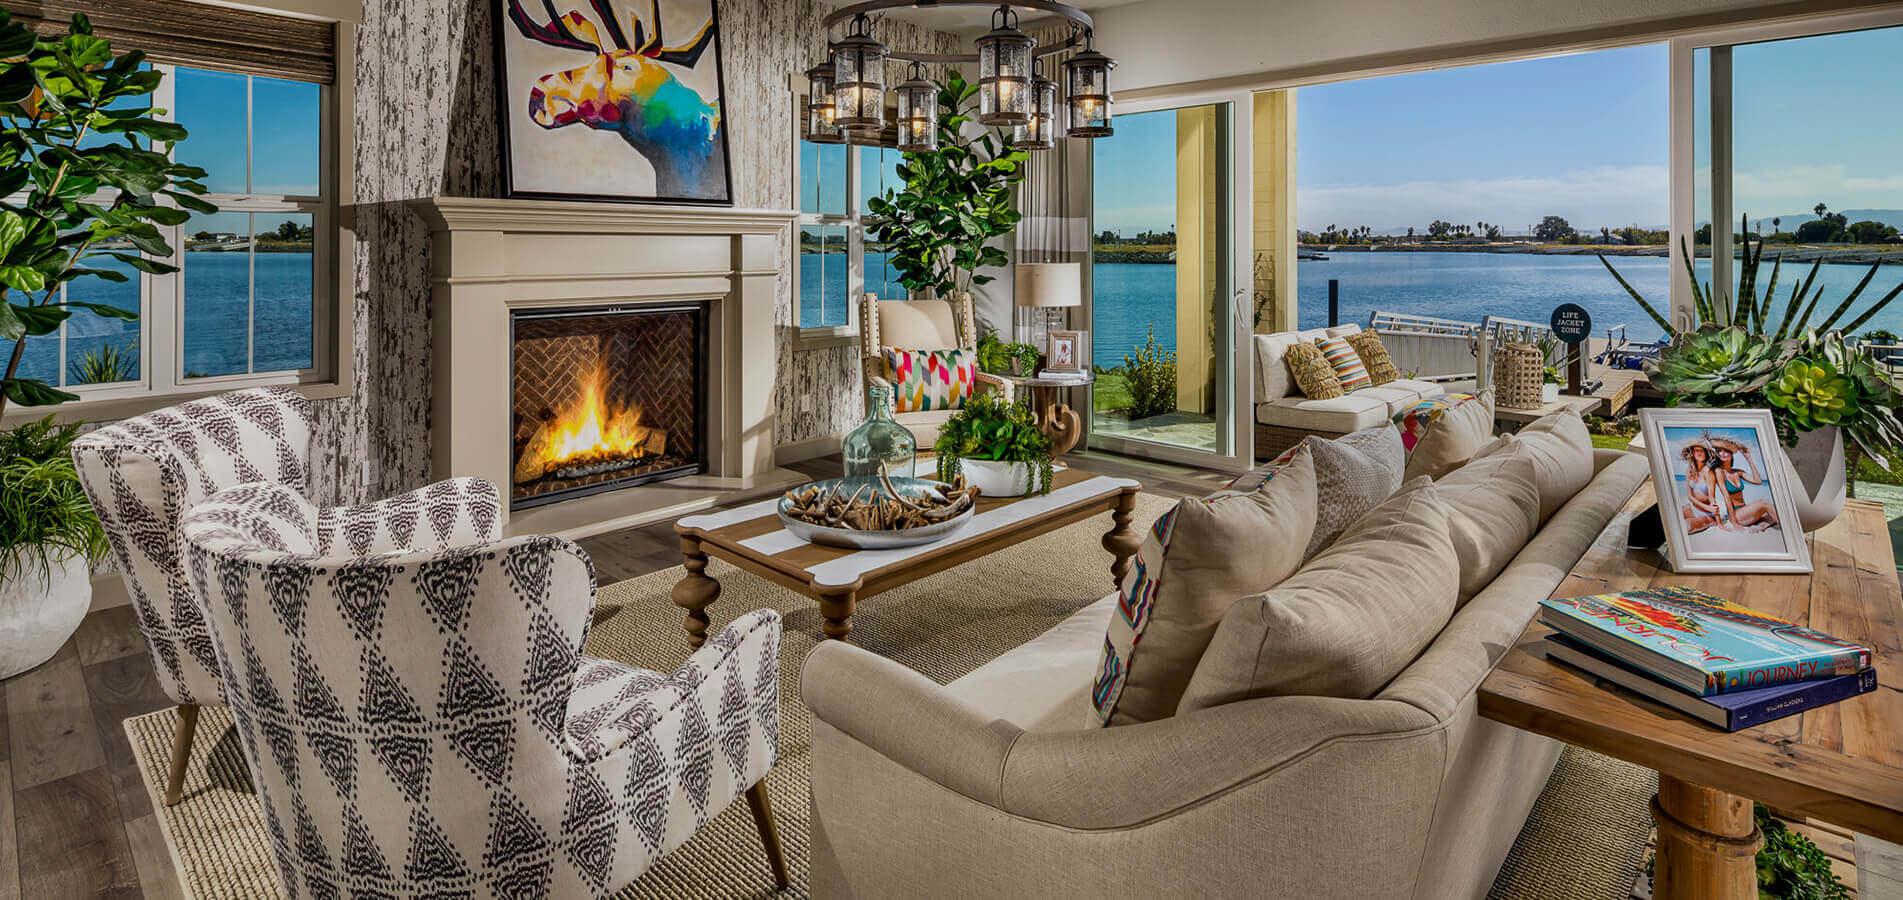 California Mantel And Fireplace Fireplace Mantel